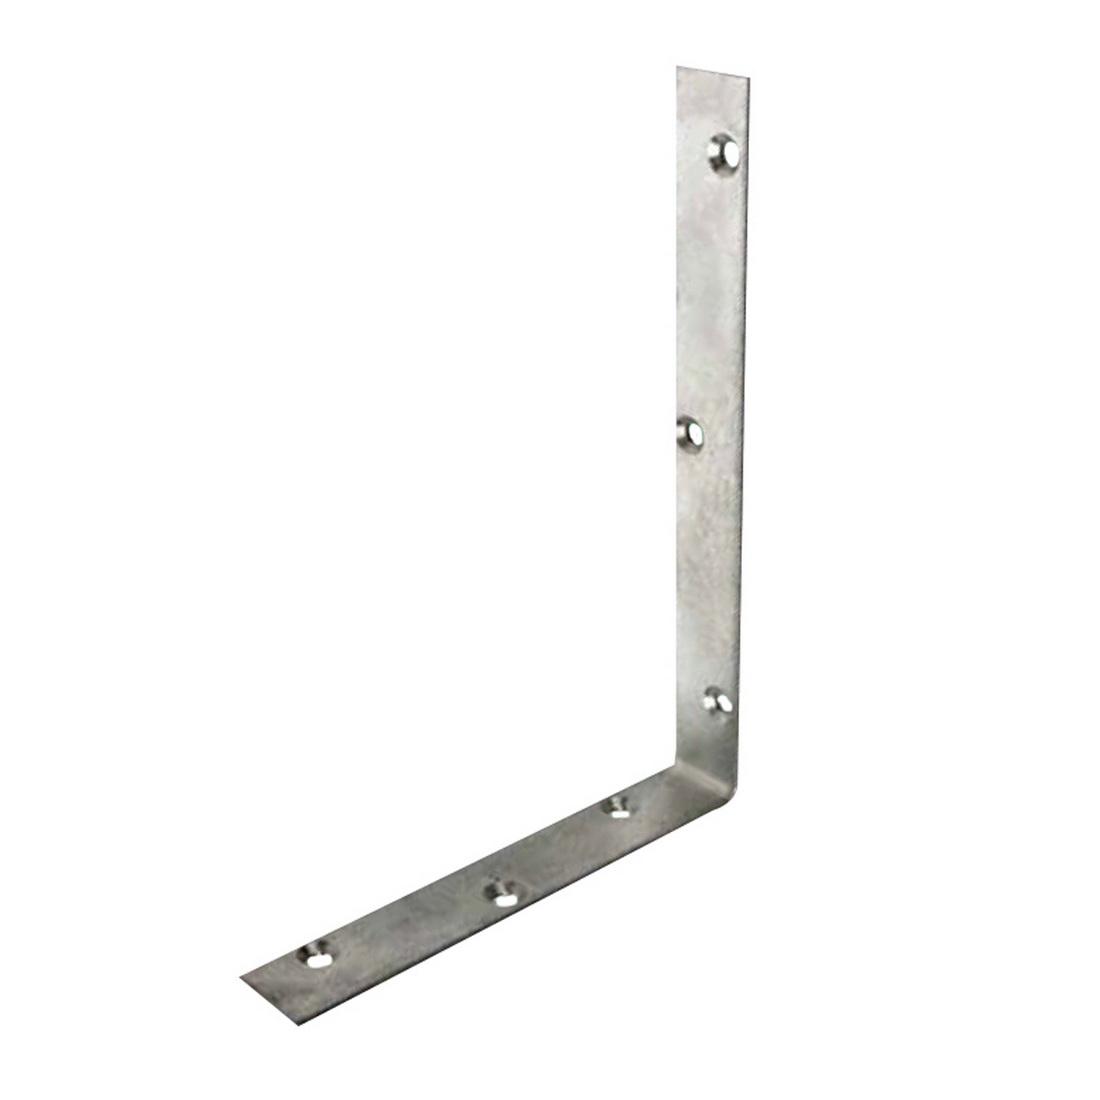 Angle Bracket 50 x 15mm Zinc Plated BANSZ050E015R